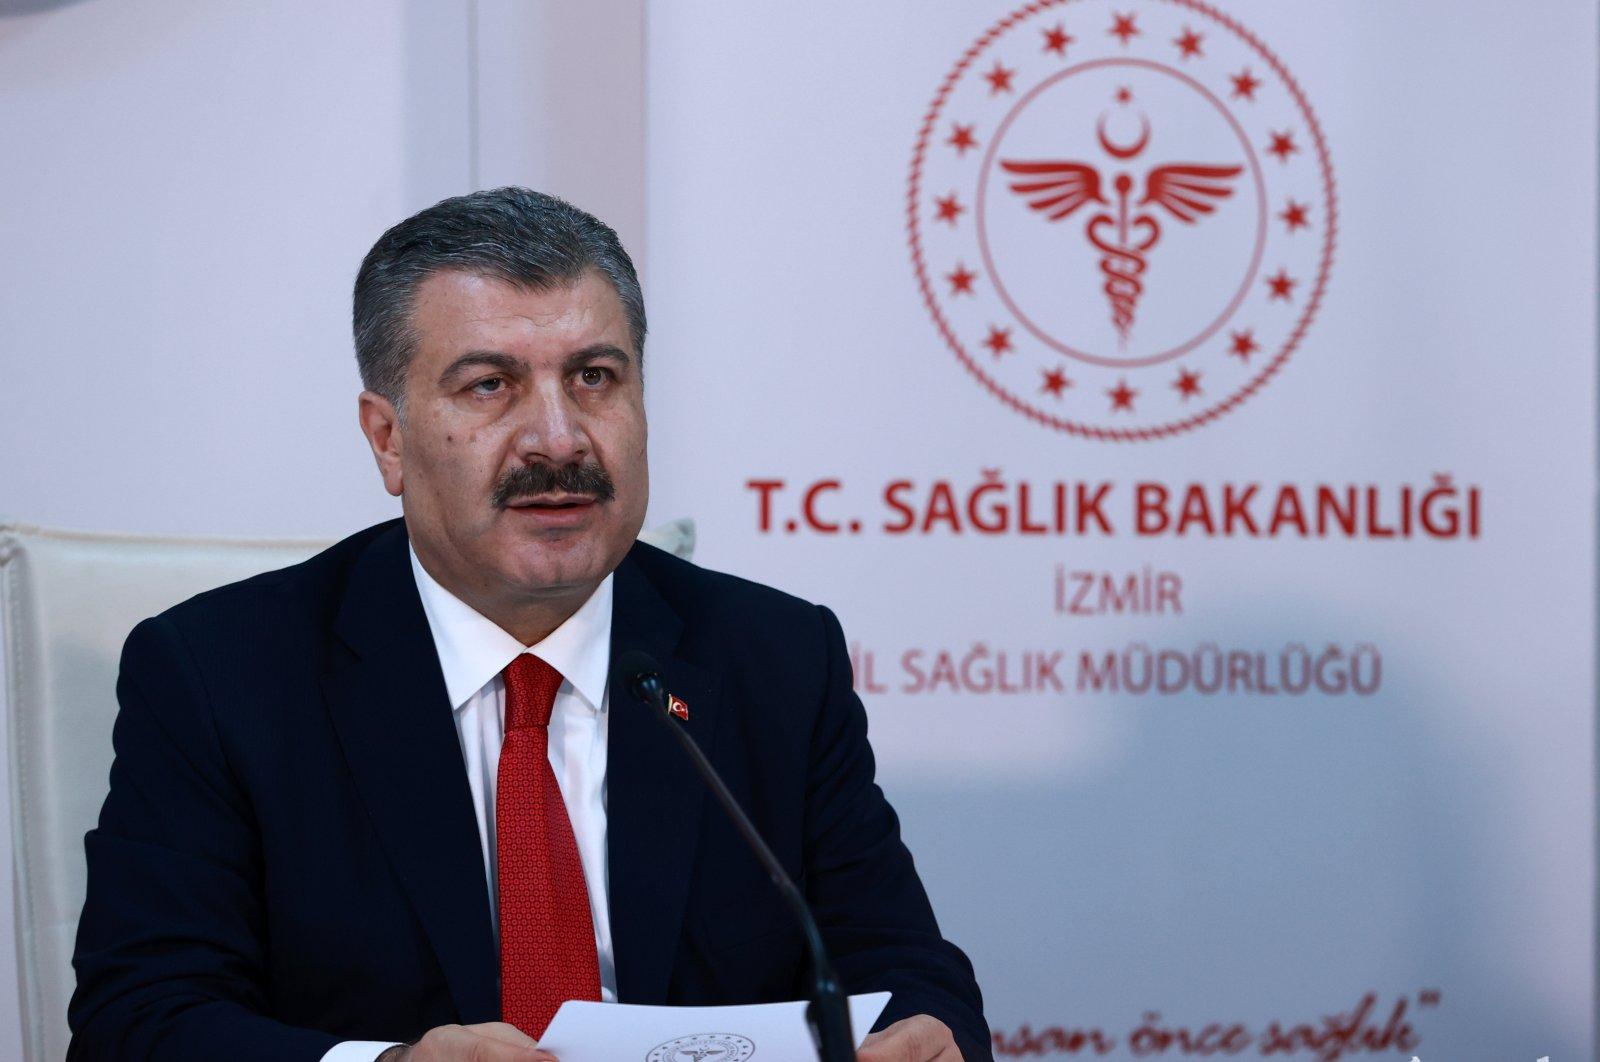 Health Minister Fahrettin Koca speaks at an event in İzmir, western Turkey, Sept. 19, 2020. (AA Photo)